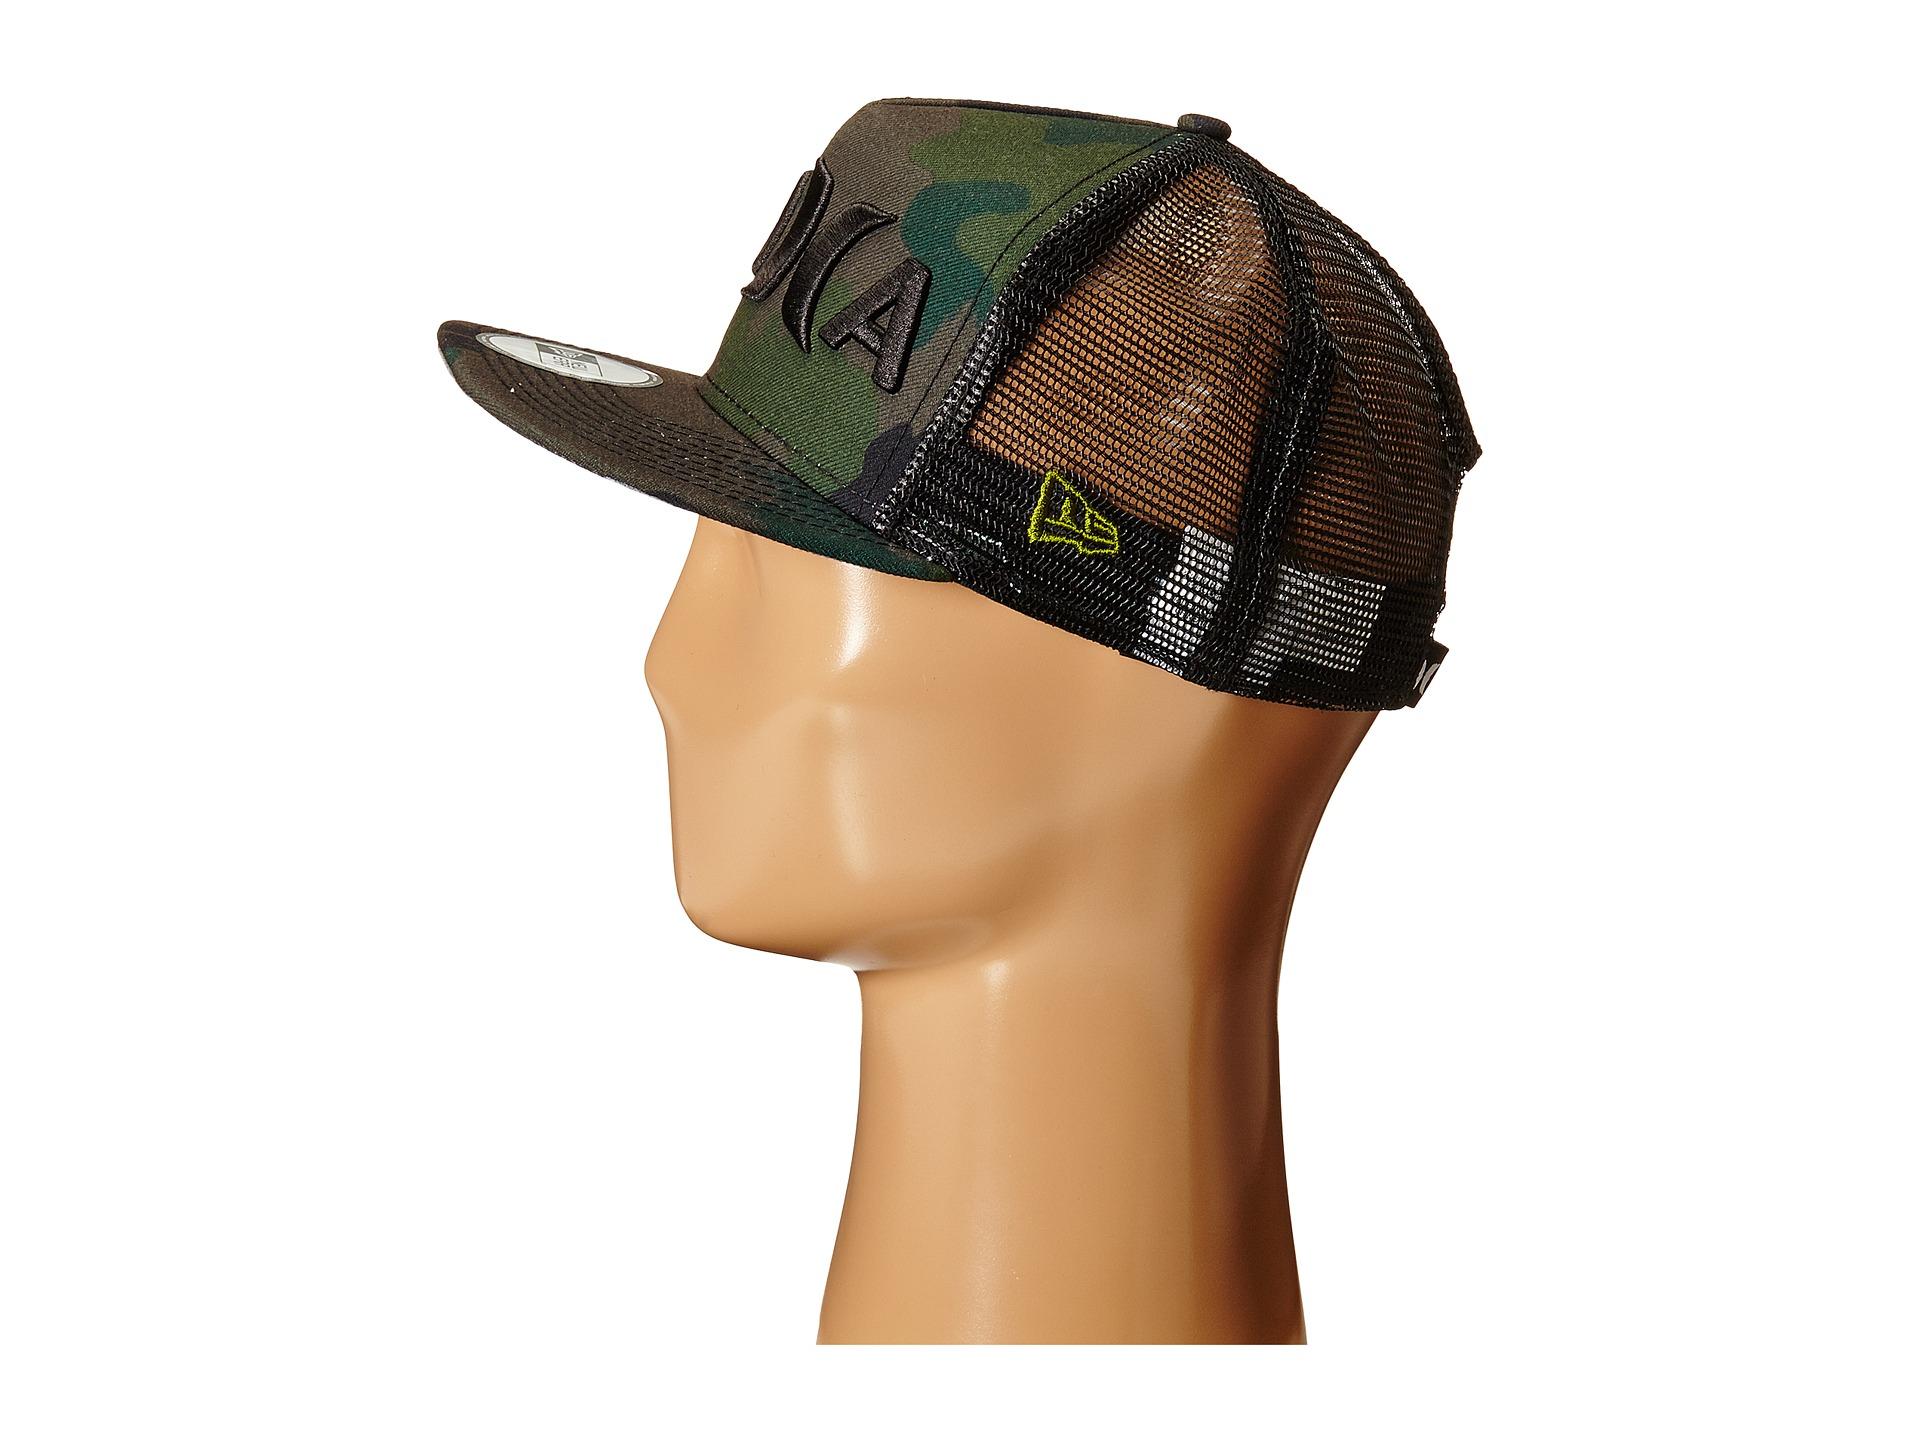 designer fashion e04b0 f4bbe ... clearance lyst hurley jjf aloha hat in green for men 64b30 98978